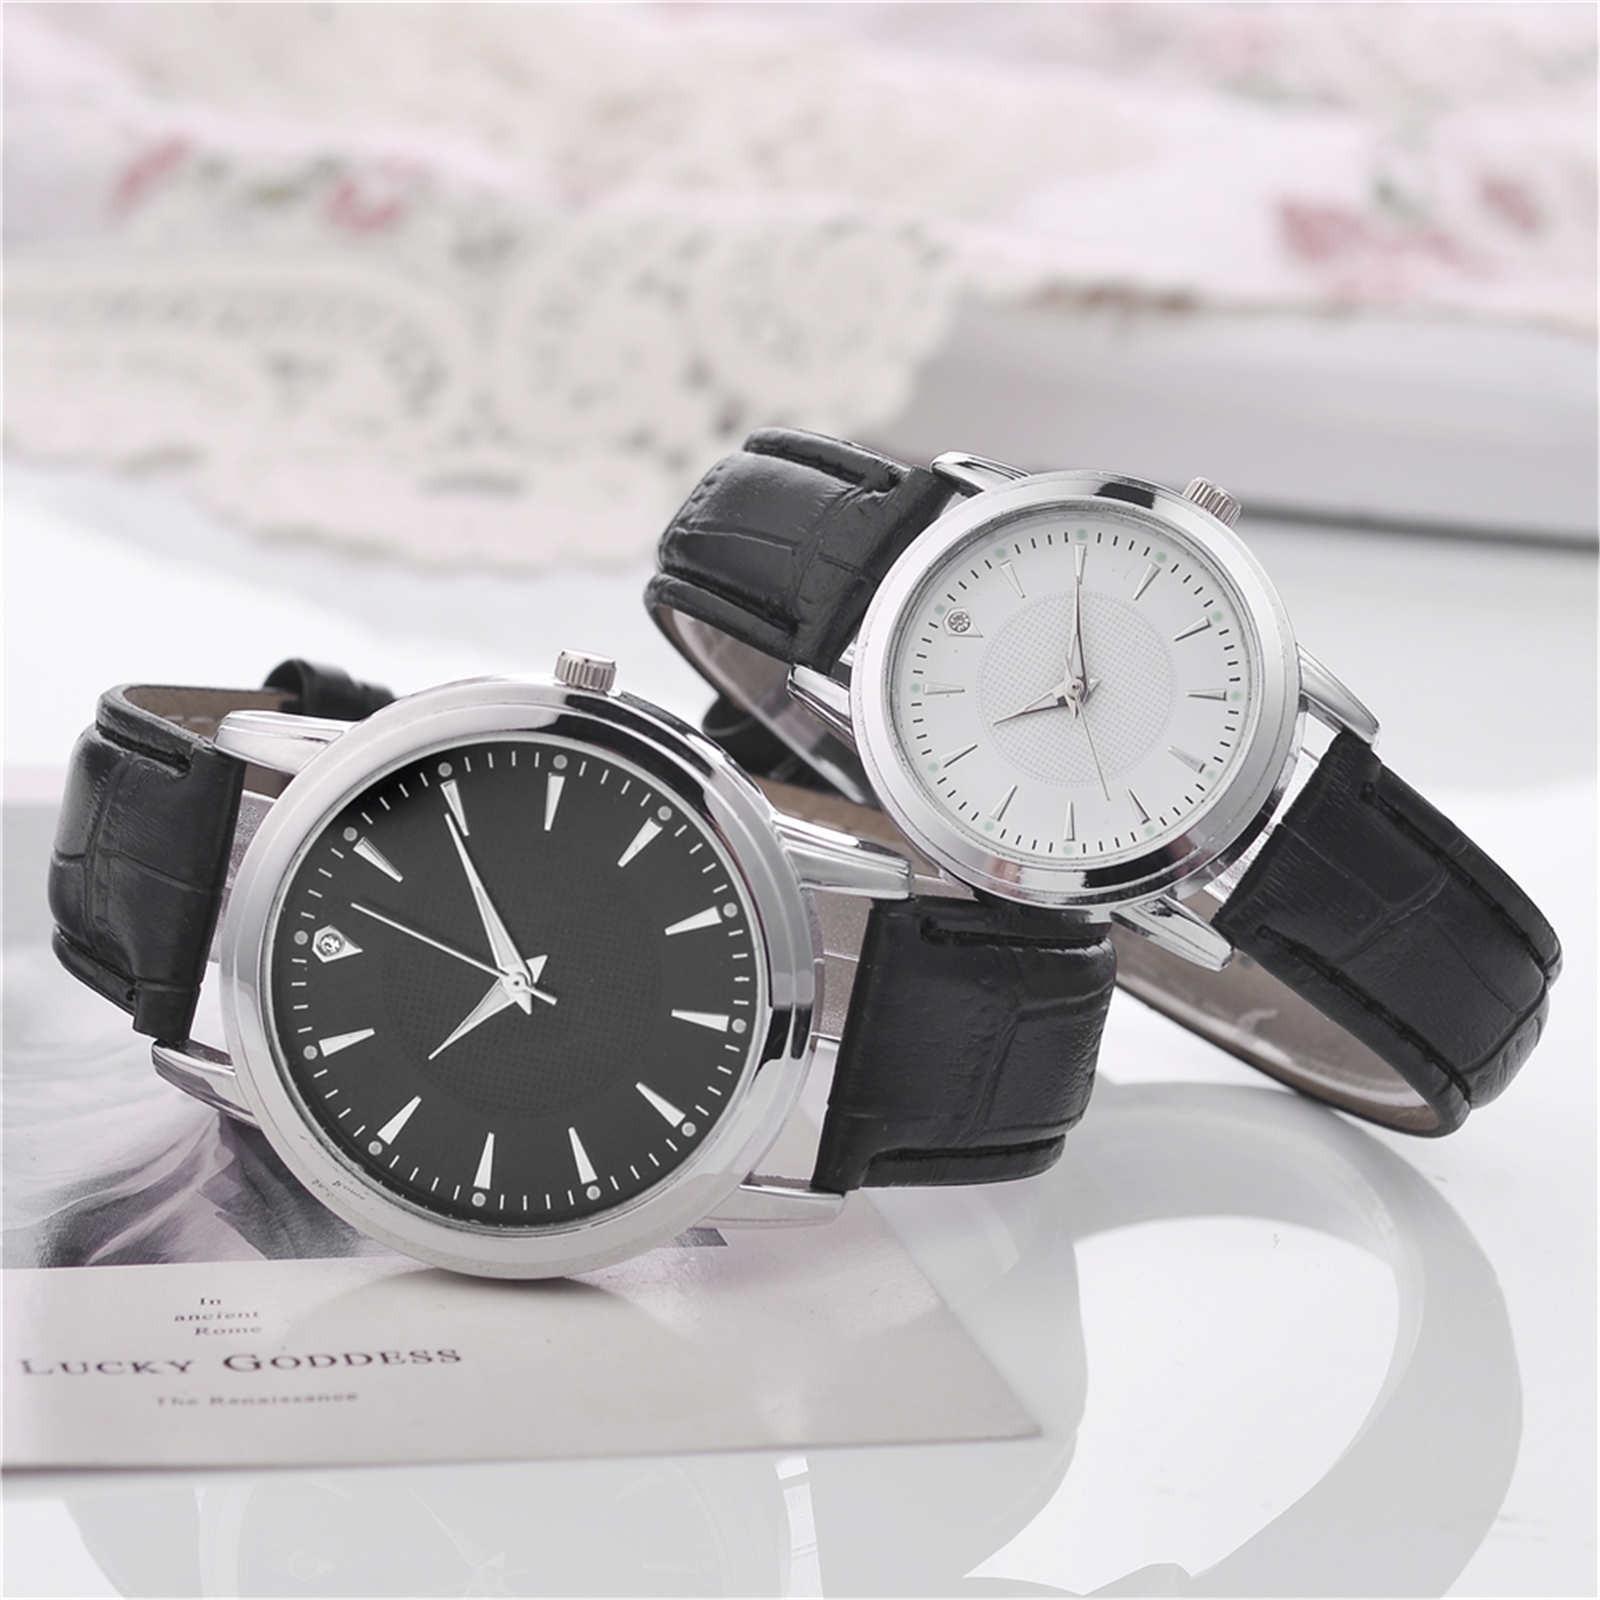 Luxury Watches Quartz Men's Watches Leather Strap 2021